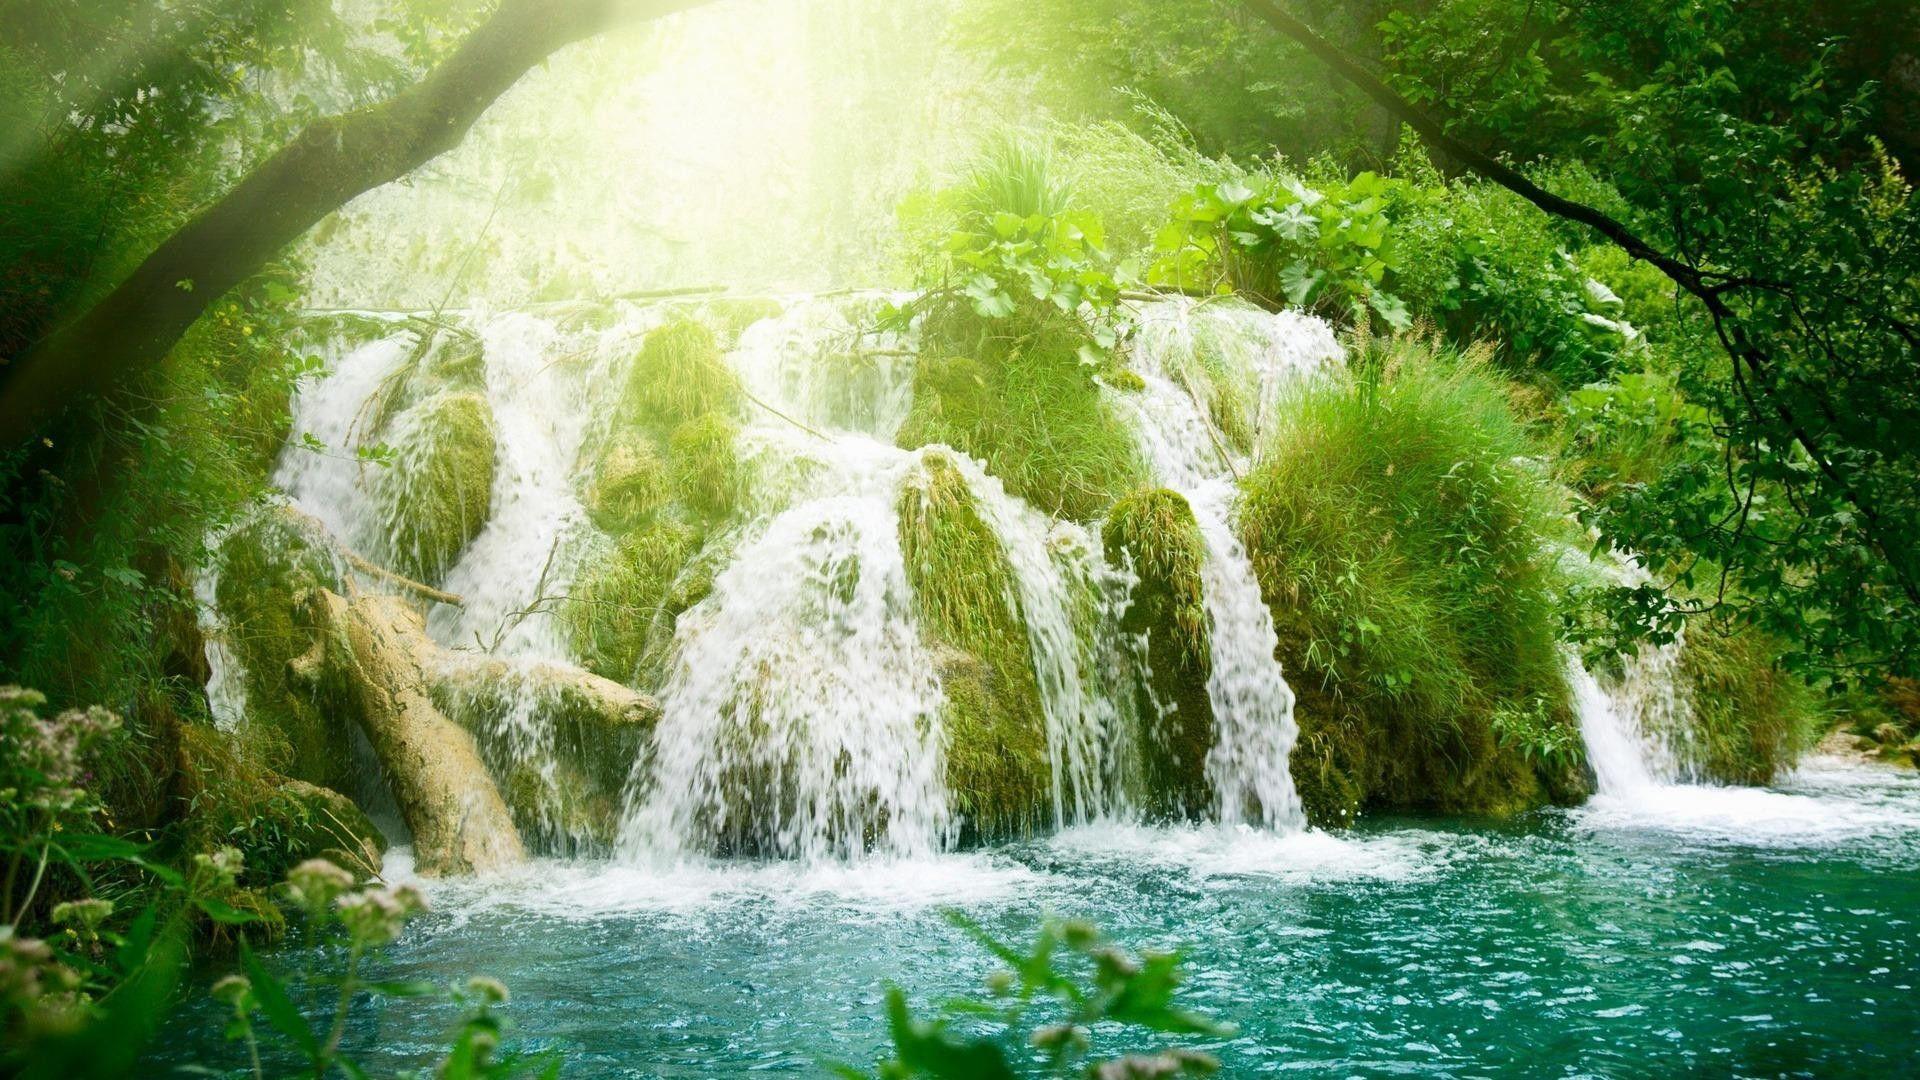 1920x1080 3d Moving Wallpaper Waterfall Landscape Waterfall Wallpaper Beautiful Nature